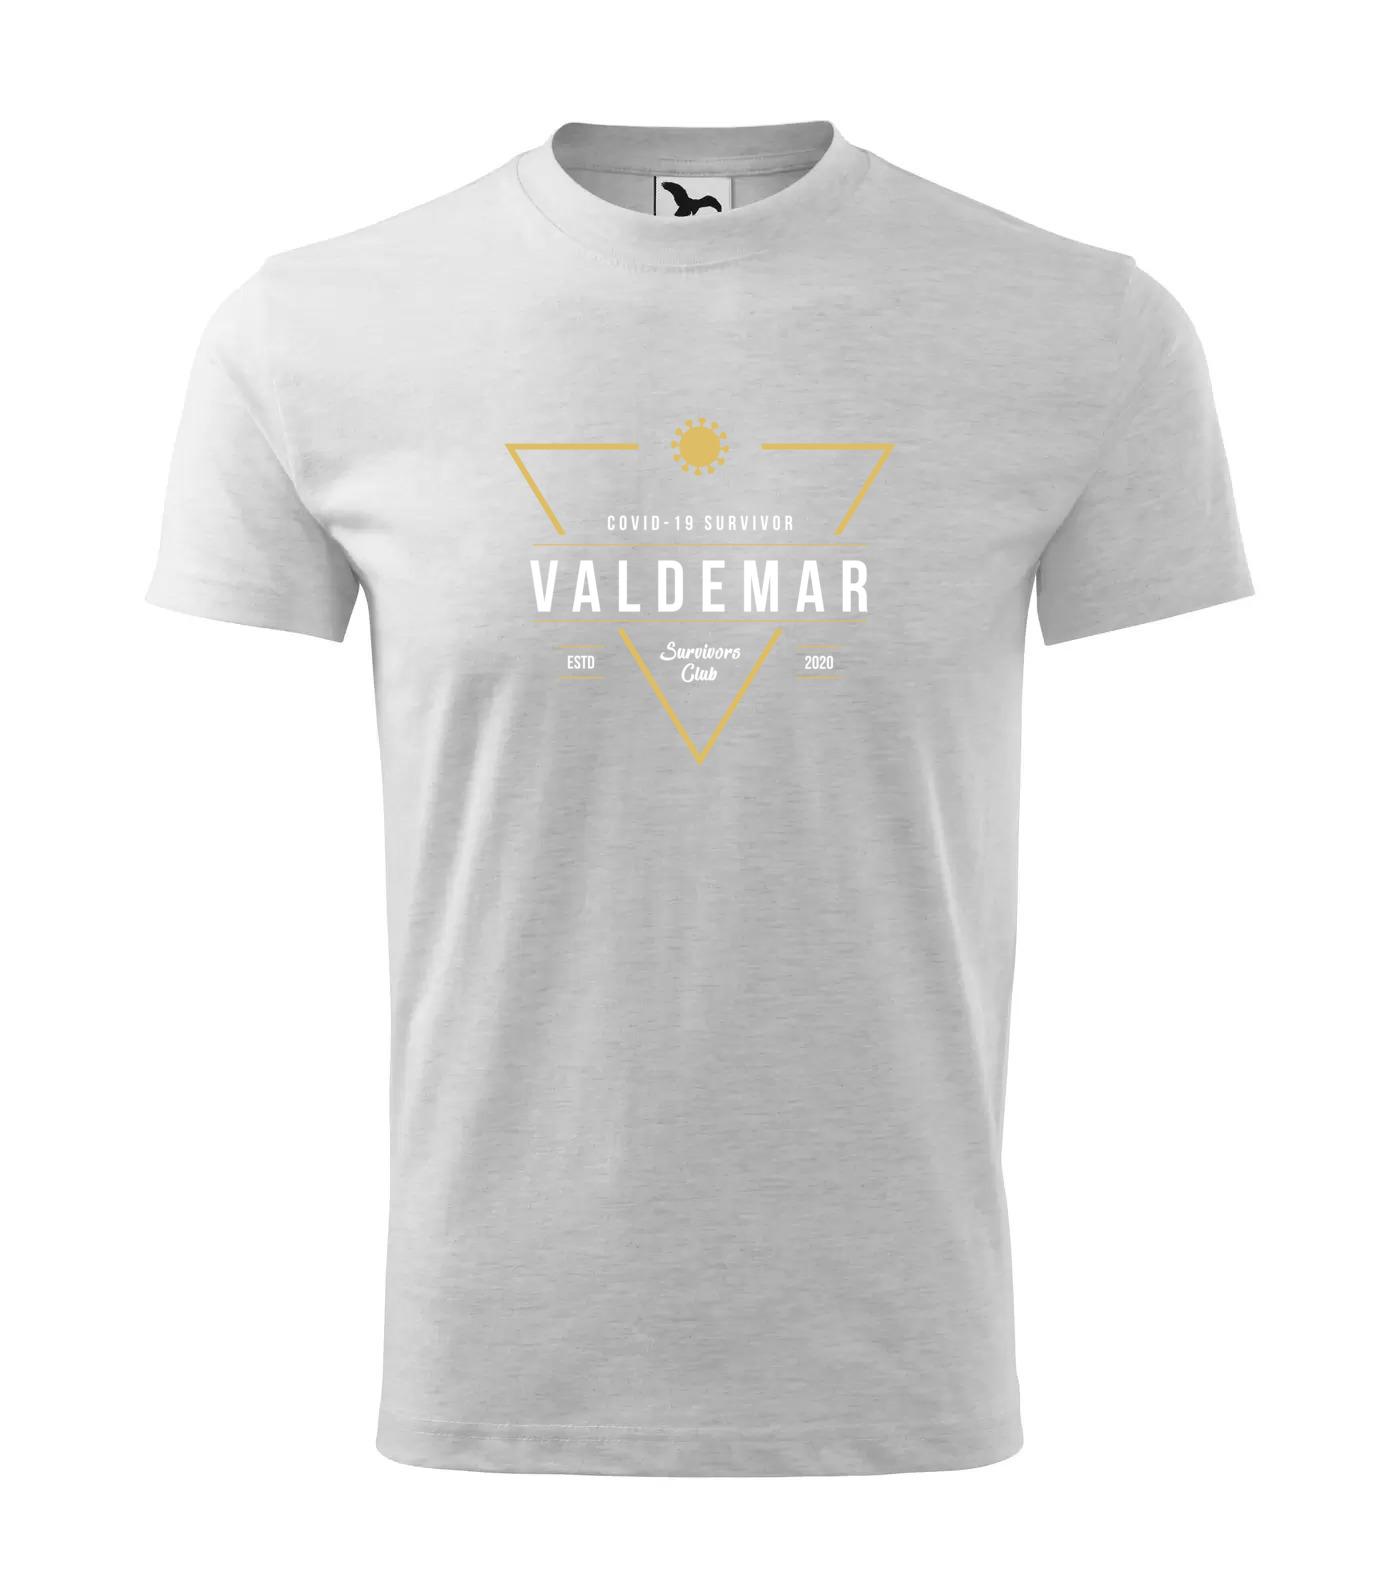 Tričko Survivor Club Valdemar